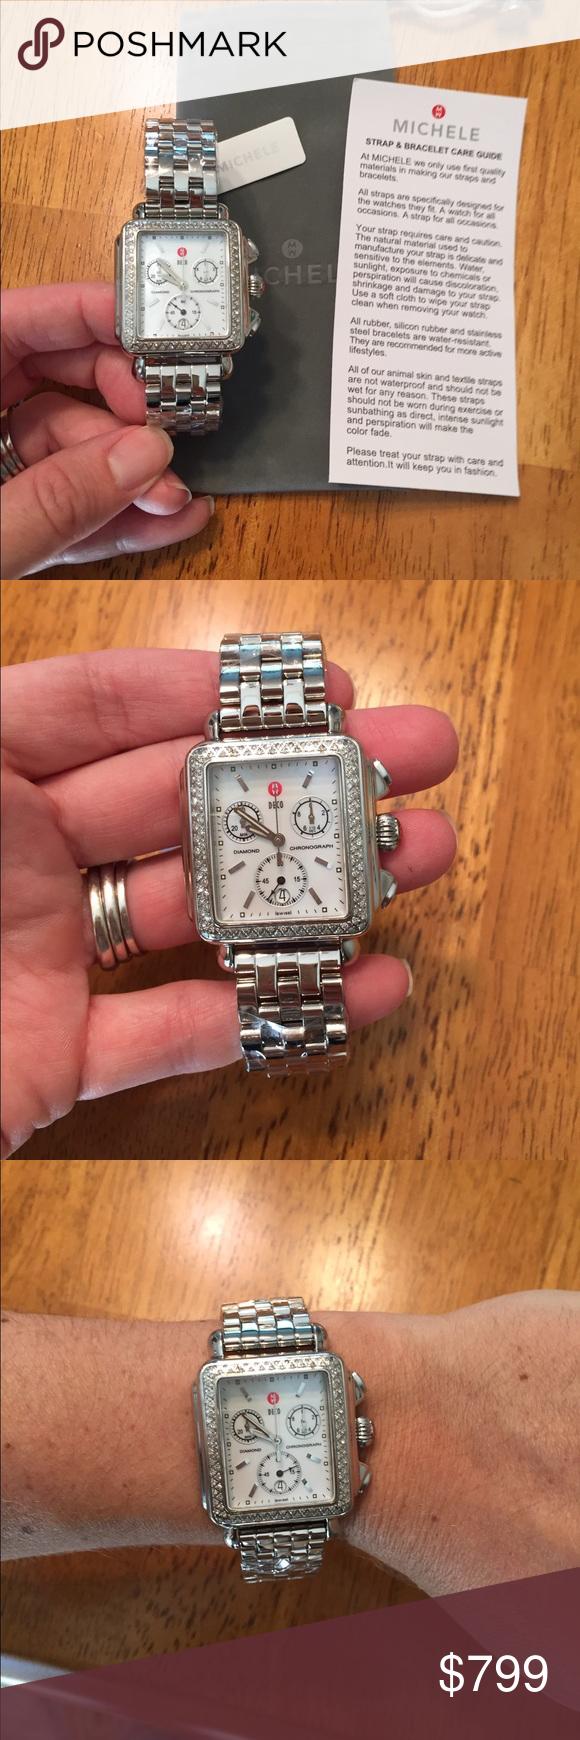 Michele diamond deco watch diamond conditioning and bracelets